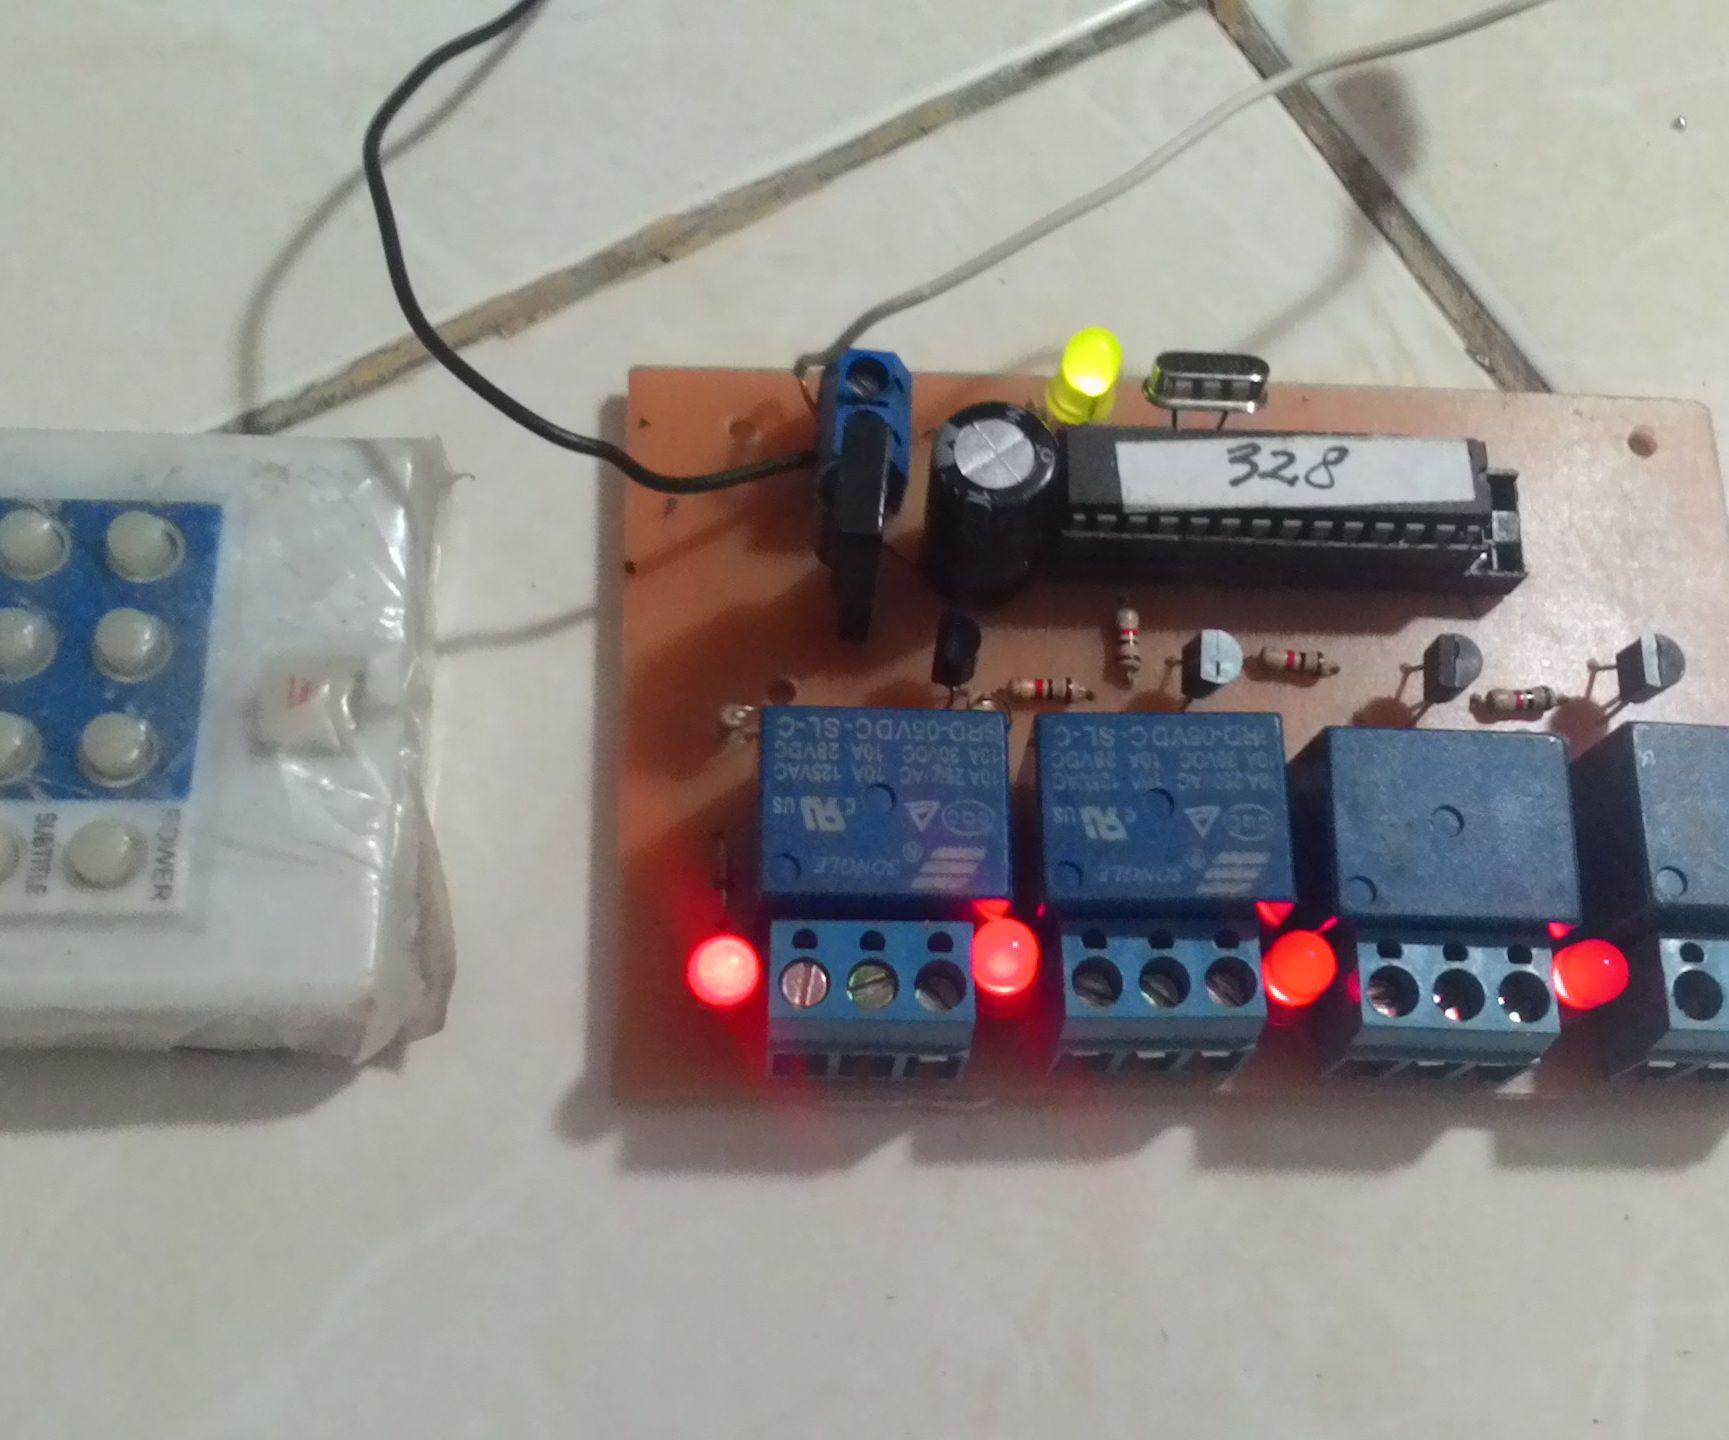 DIY 4 channel IR remote controller